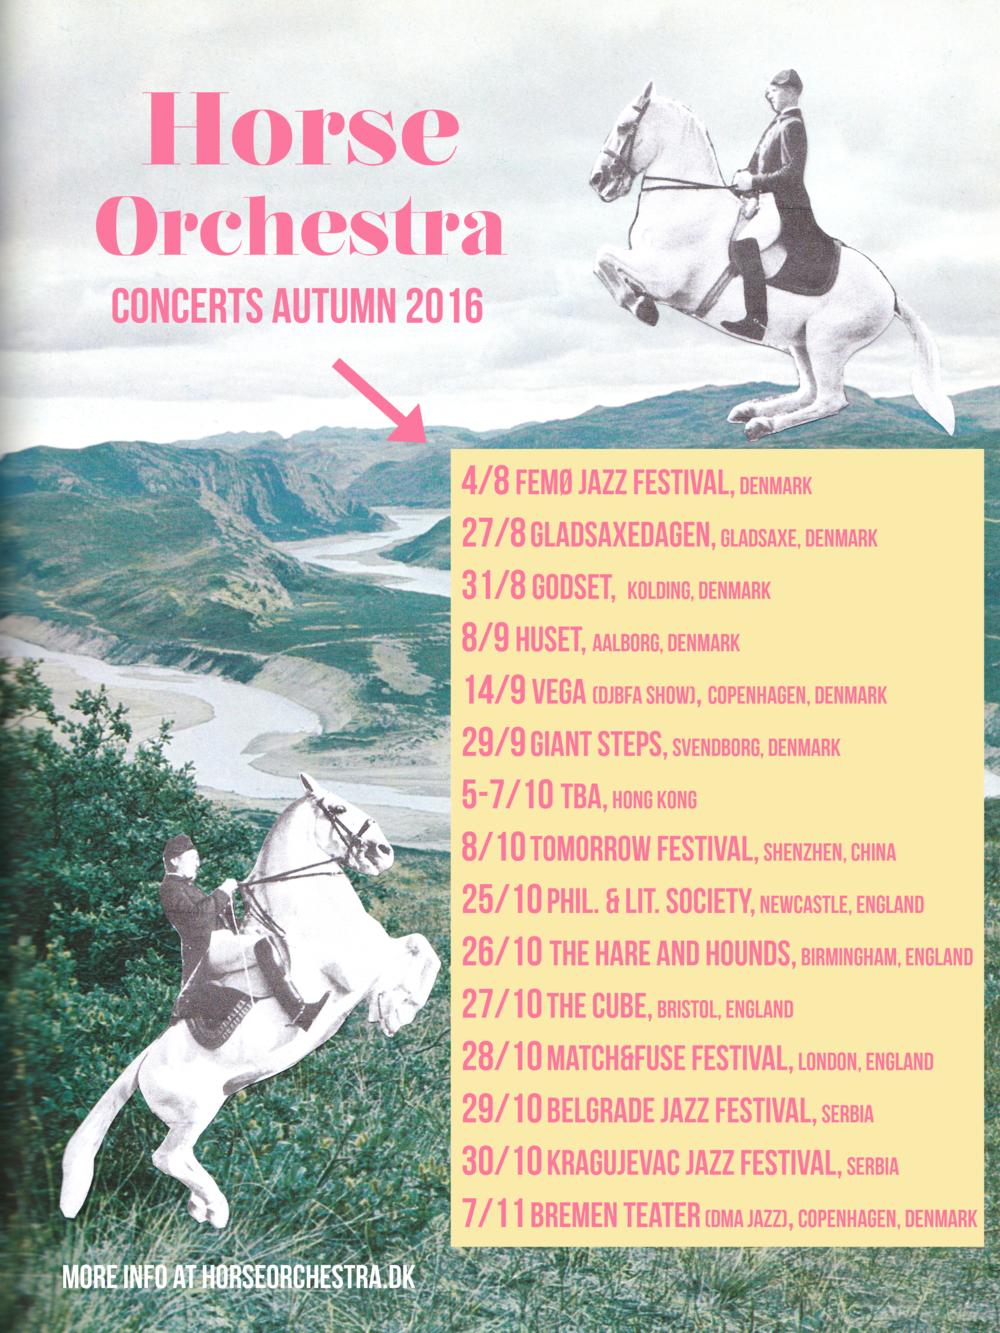 Horse Orchestra Concert Autumn 2016